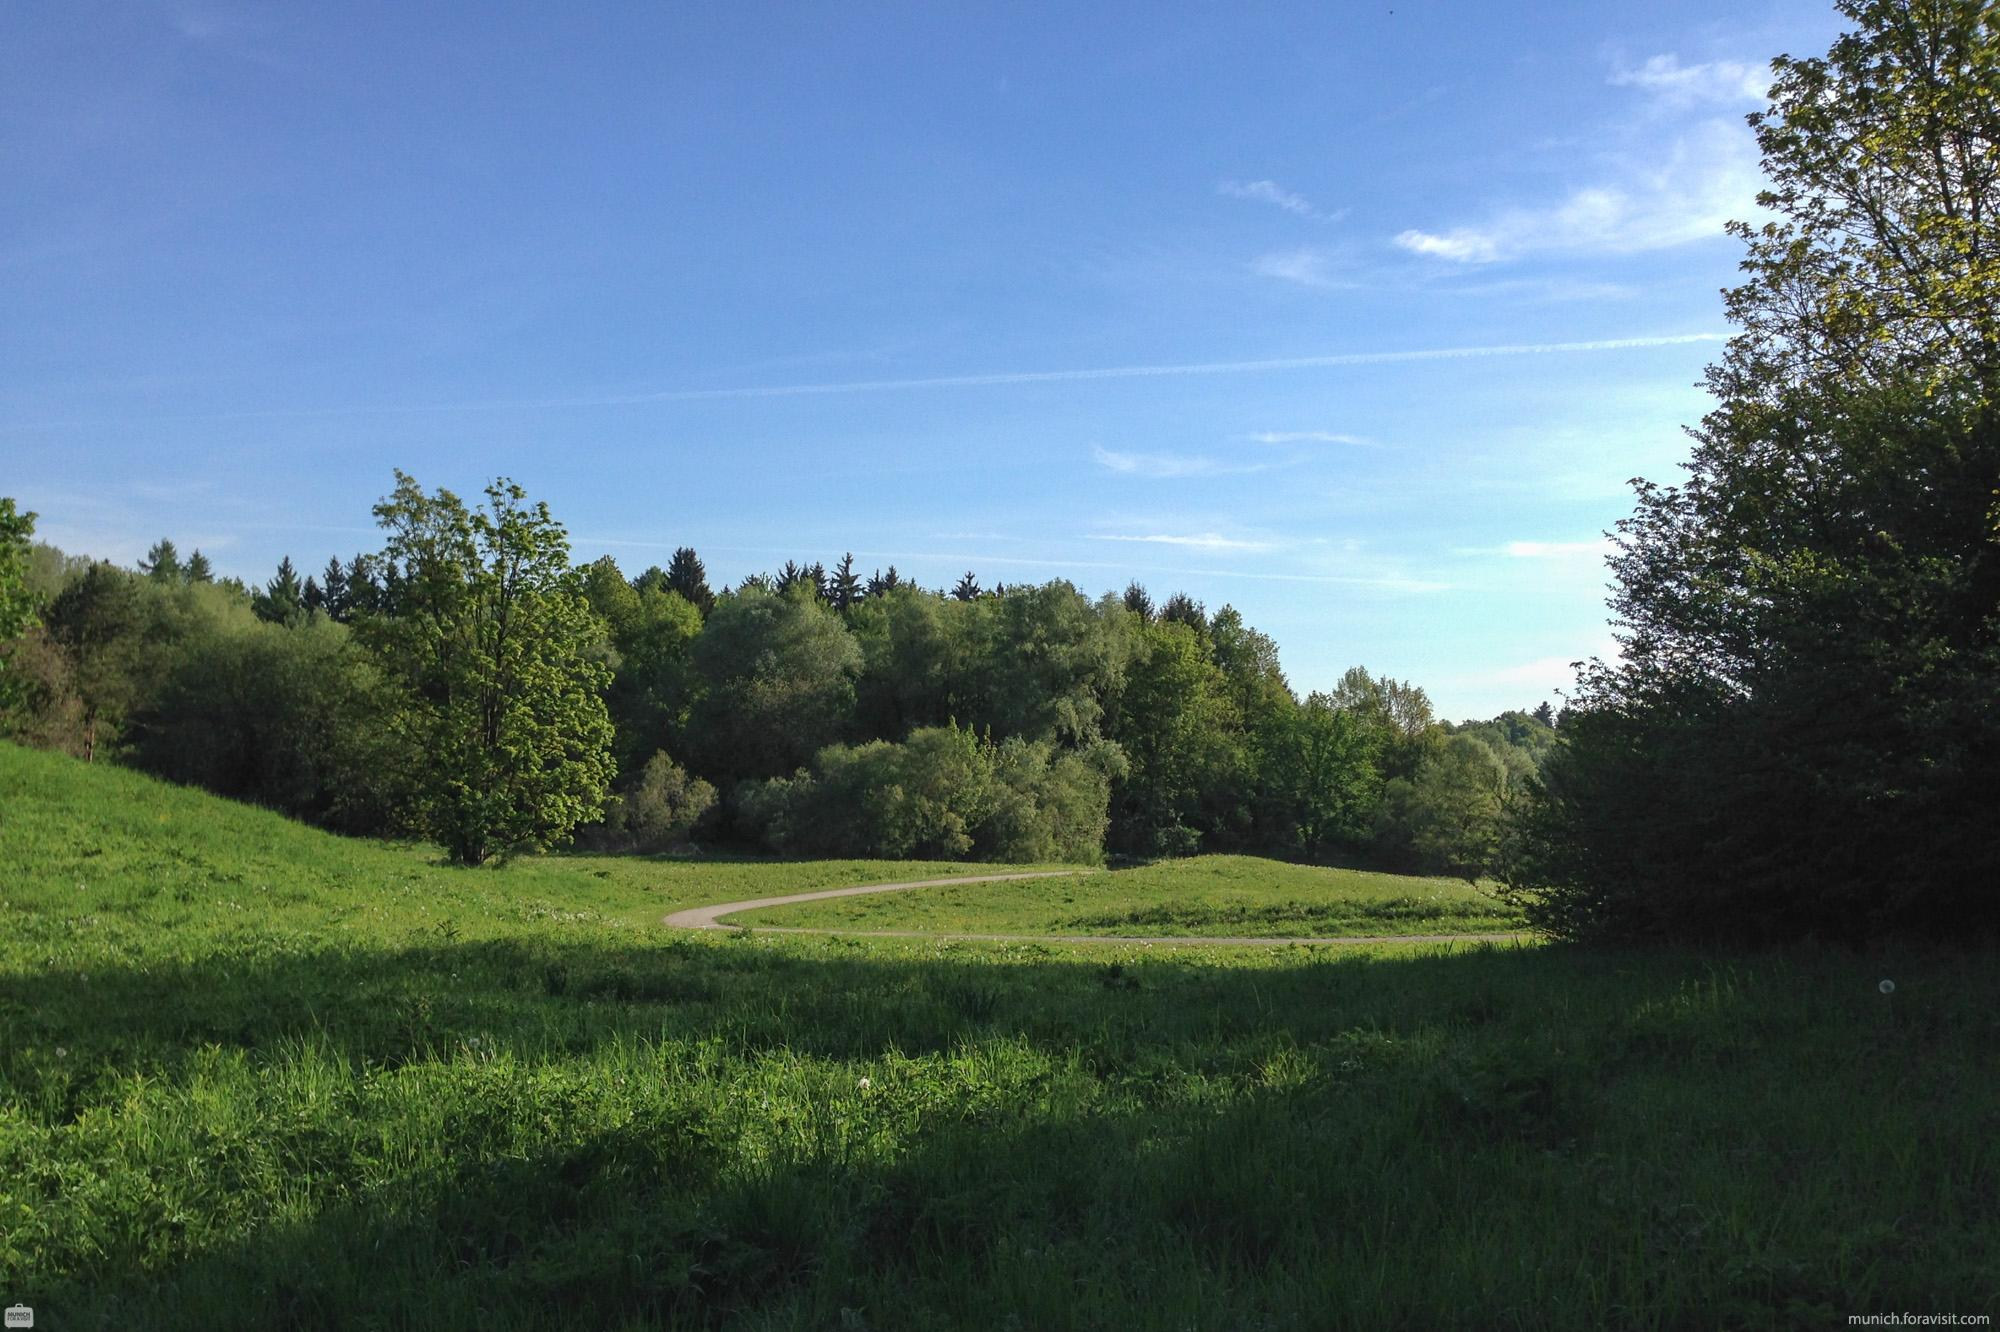 Aubinger Lohe Munich Recreation, Hiking & Running Route